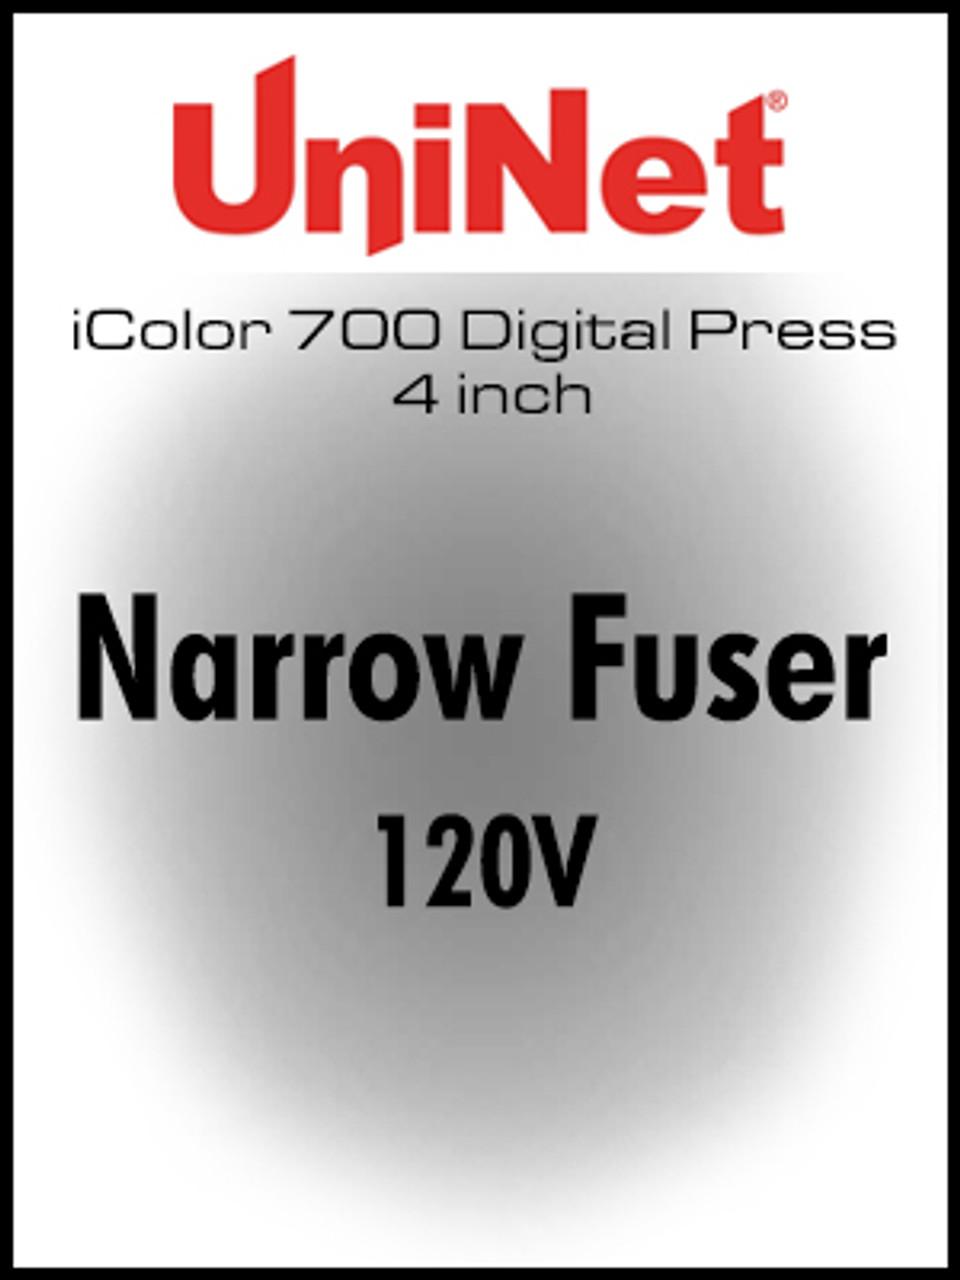 iColor 700 Digital Press 4 inch Narrow Fuser 120V